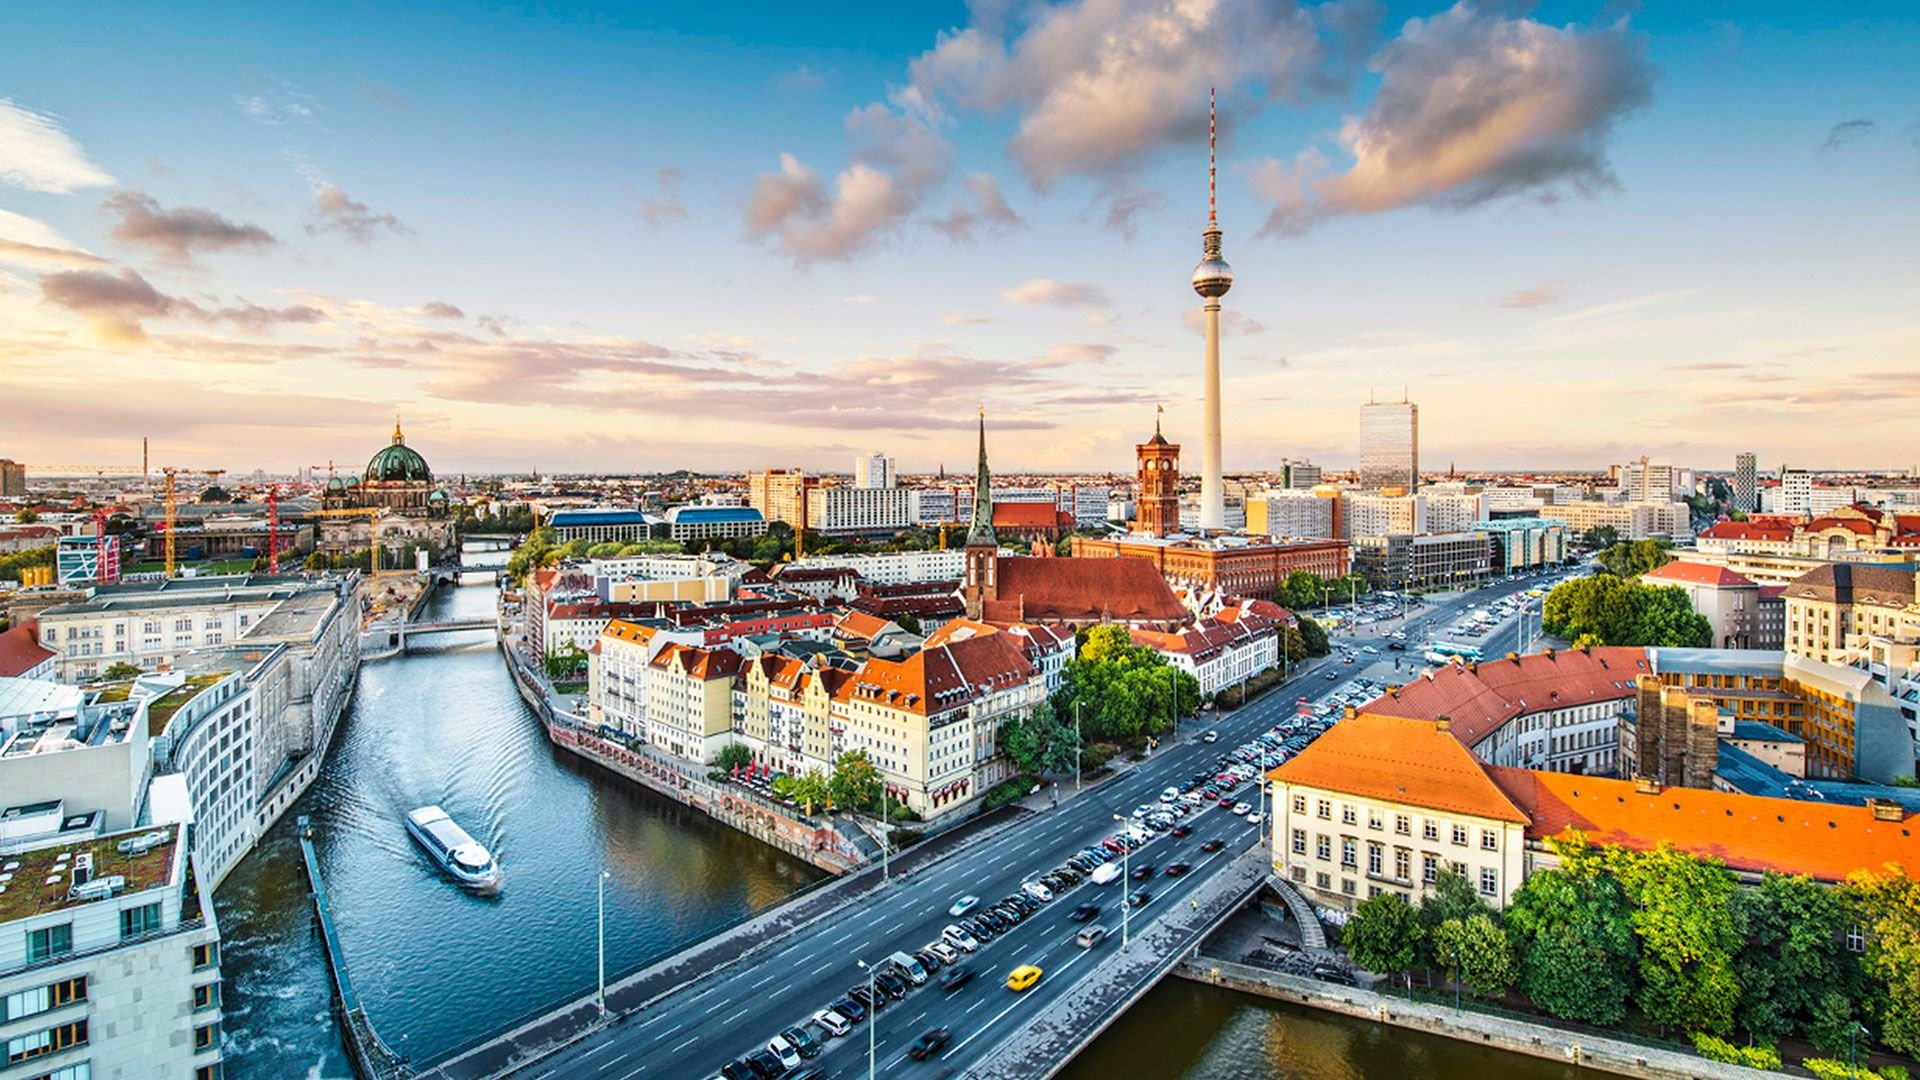 Berlin HD Desktop Wallpaper